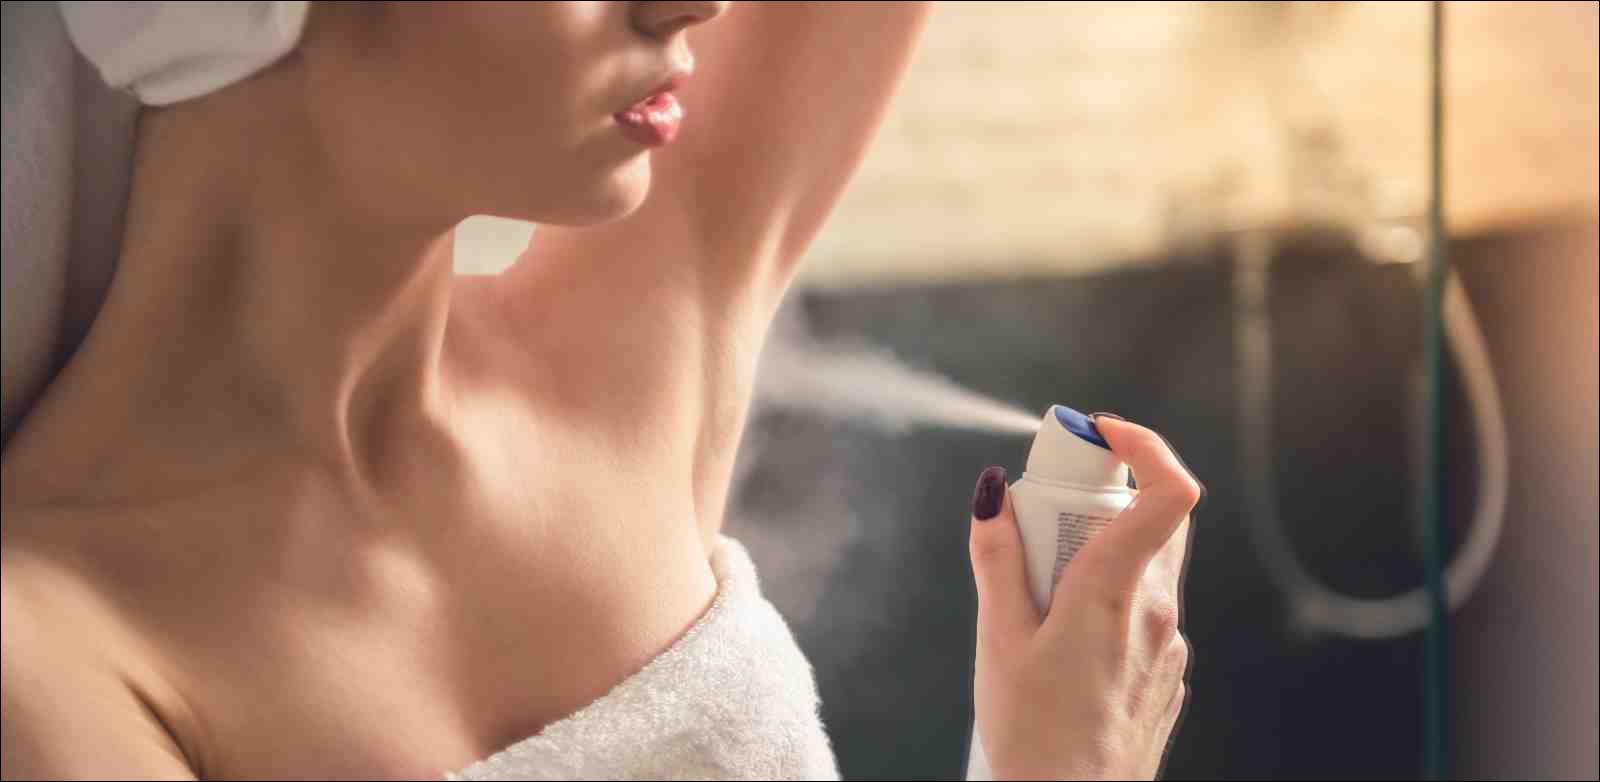 woman in bath towel applying antiperspirant after shower